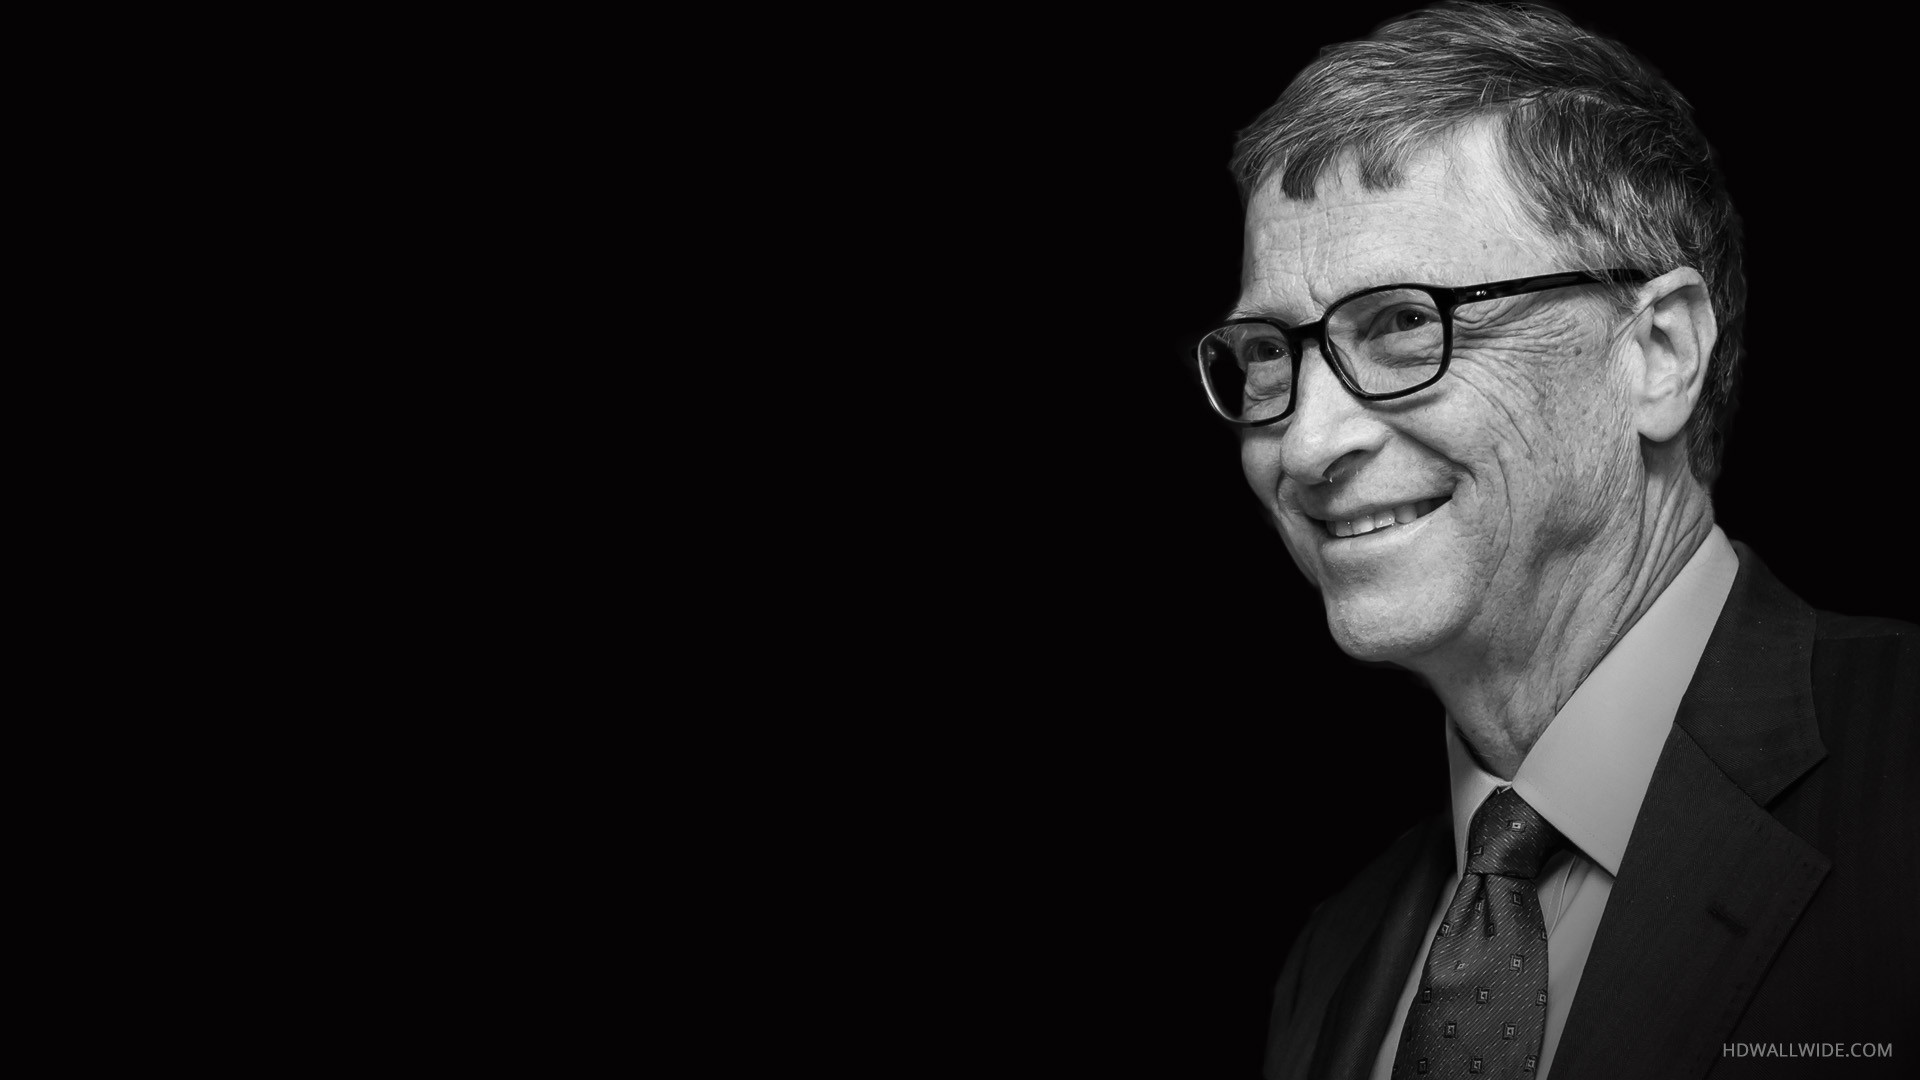 Bill Gates Wallpaper 73 images 1920x1080